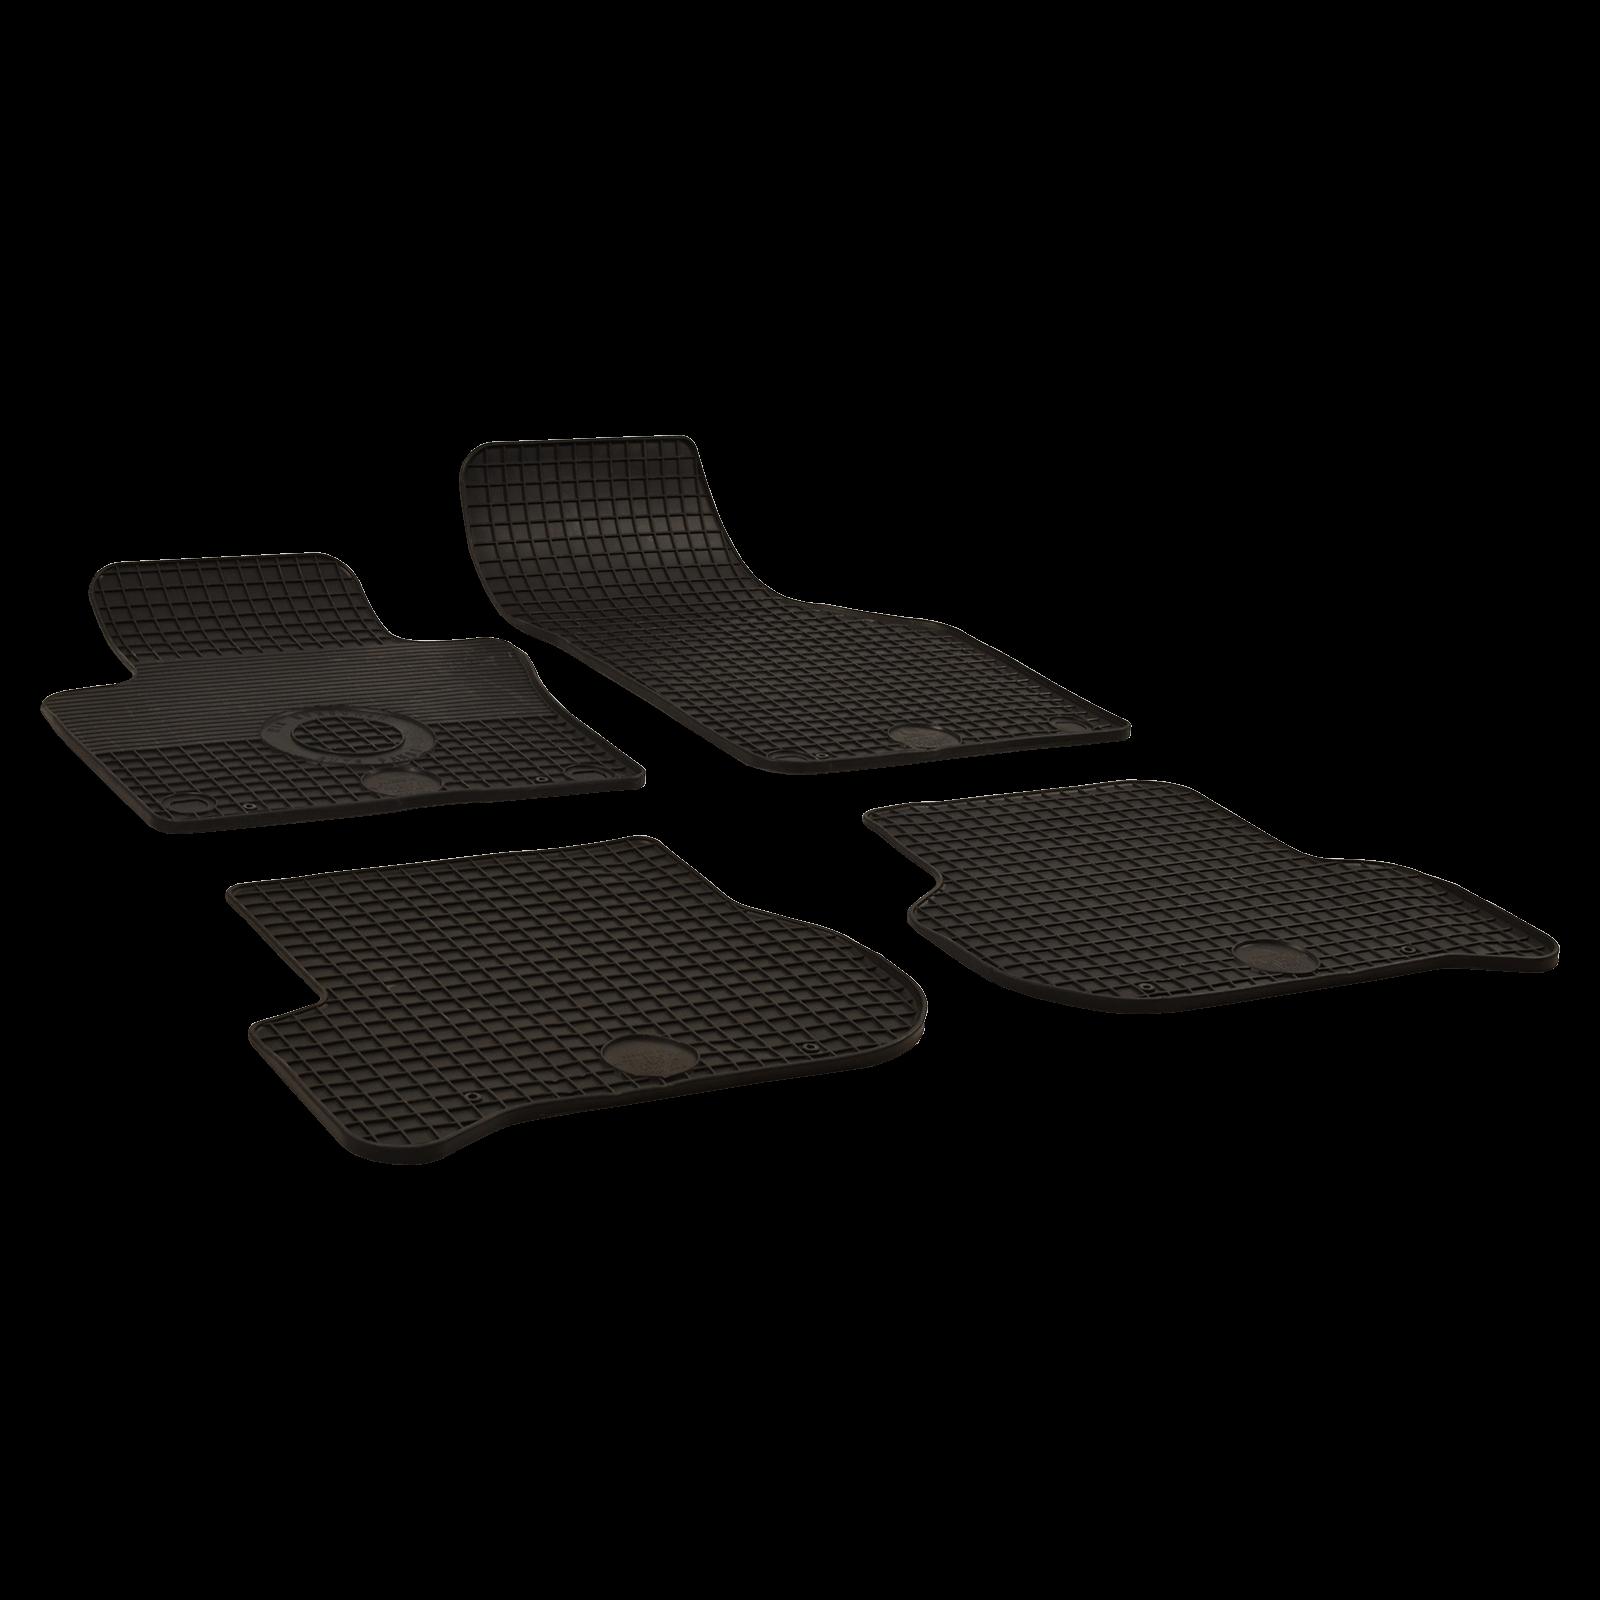 gummi fu matten schwarz f r seat leon bj. Black Bedroom Furniture Sets. Home Design Ideas